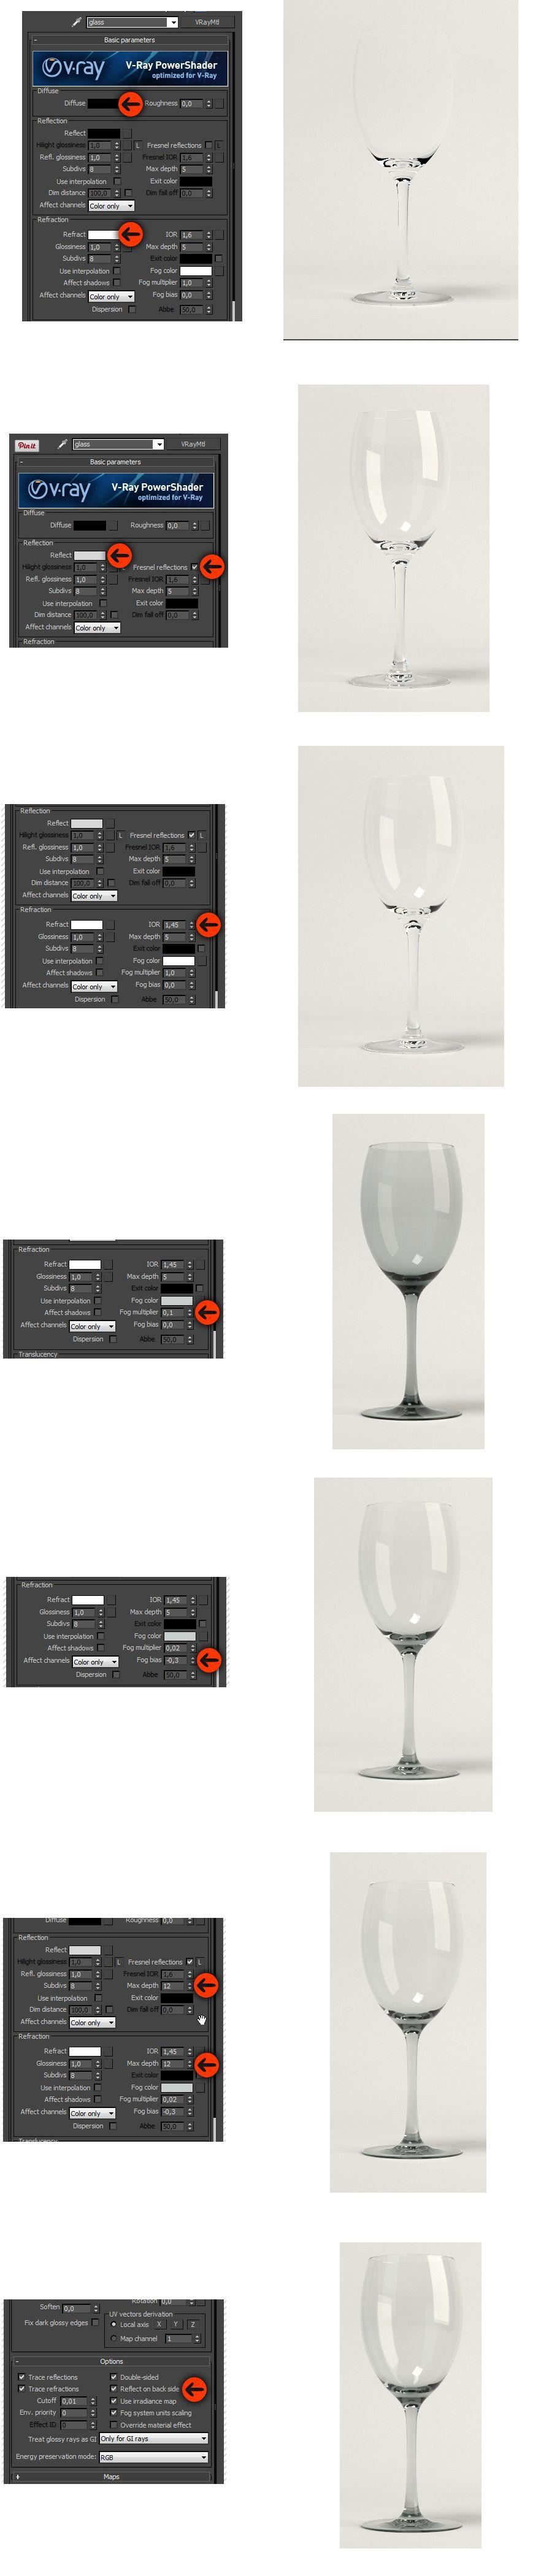 066797f67686c421a6864c648498f564.jpg (Image JPEG, 900 × 4200 pixels) - Redimensionnée (36%)